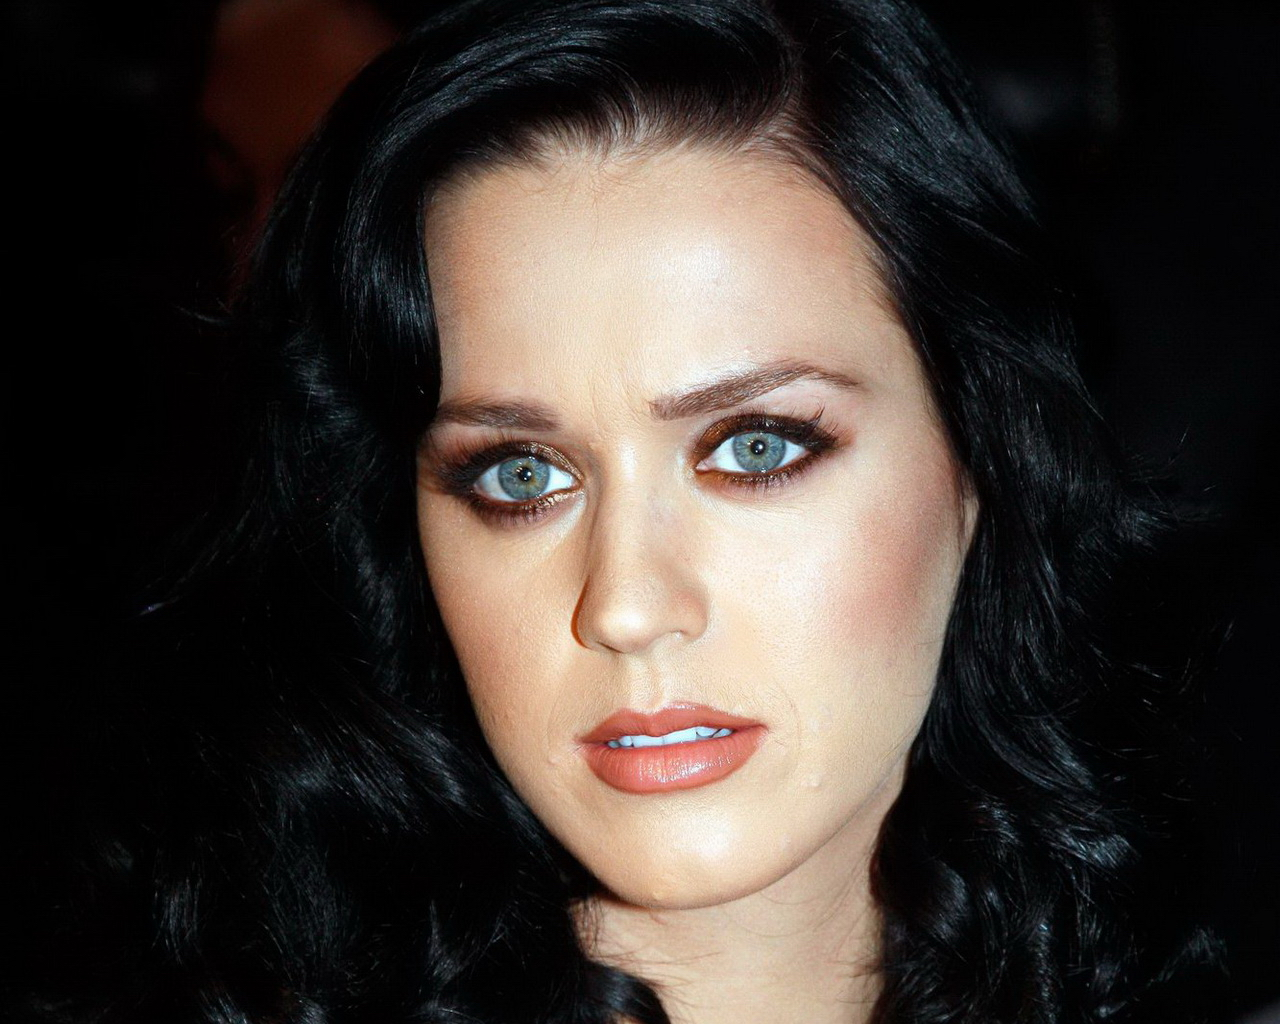 Katy Perry: Katy Perry Eyes